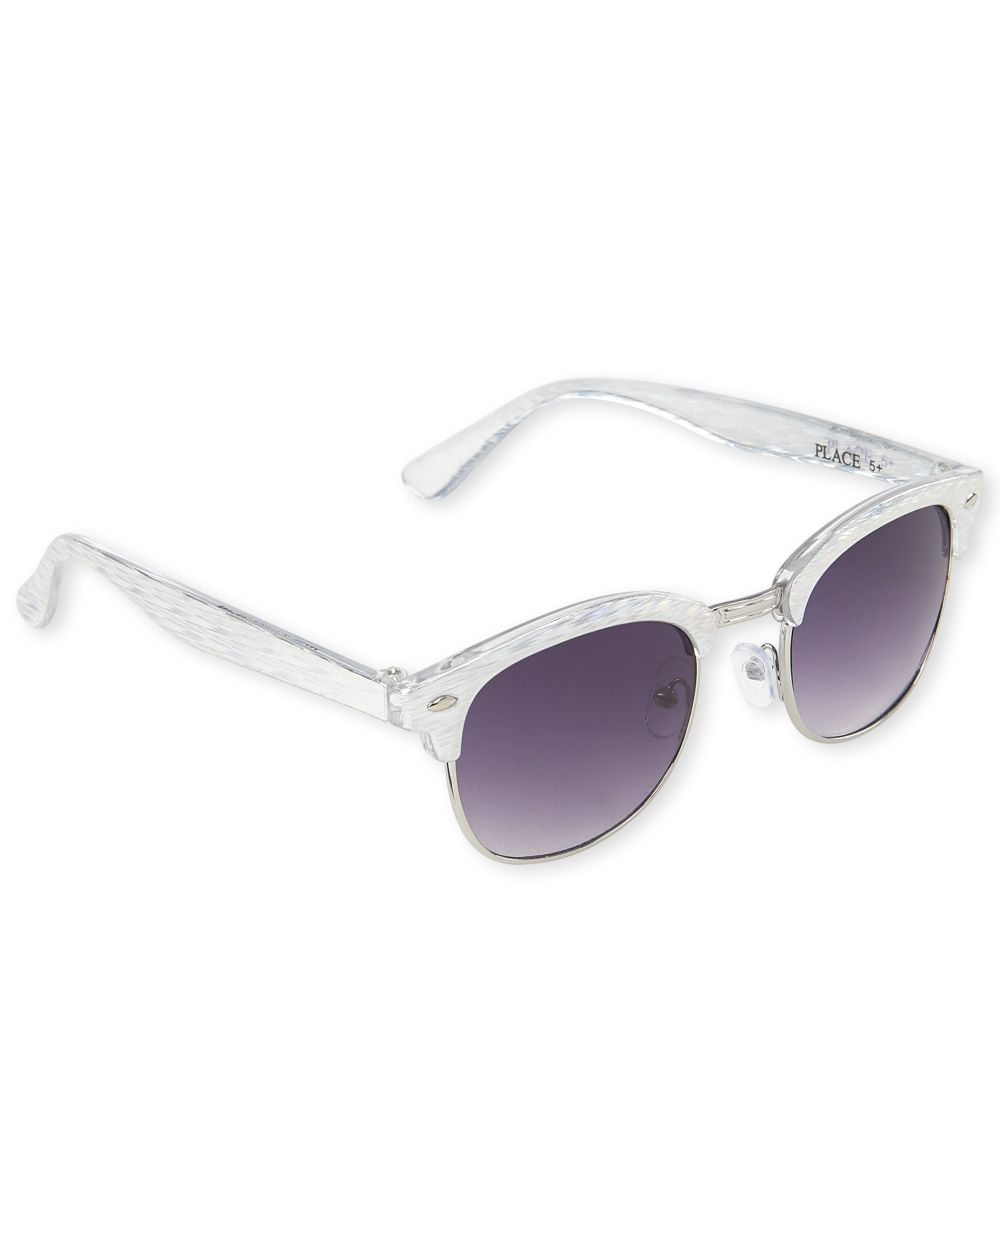 Girls Holographic Retro Sunglasses